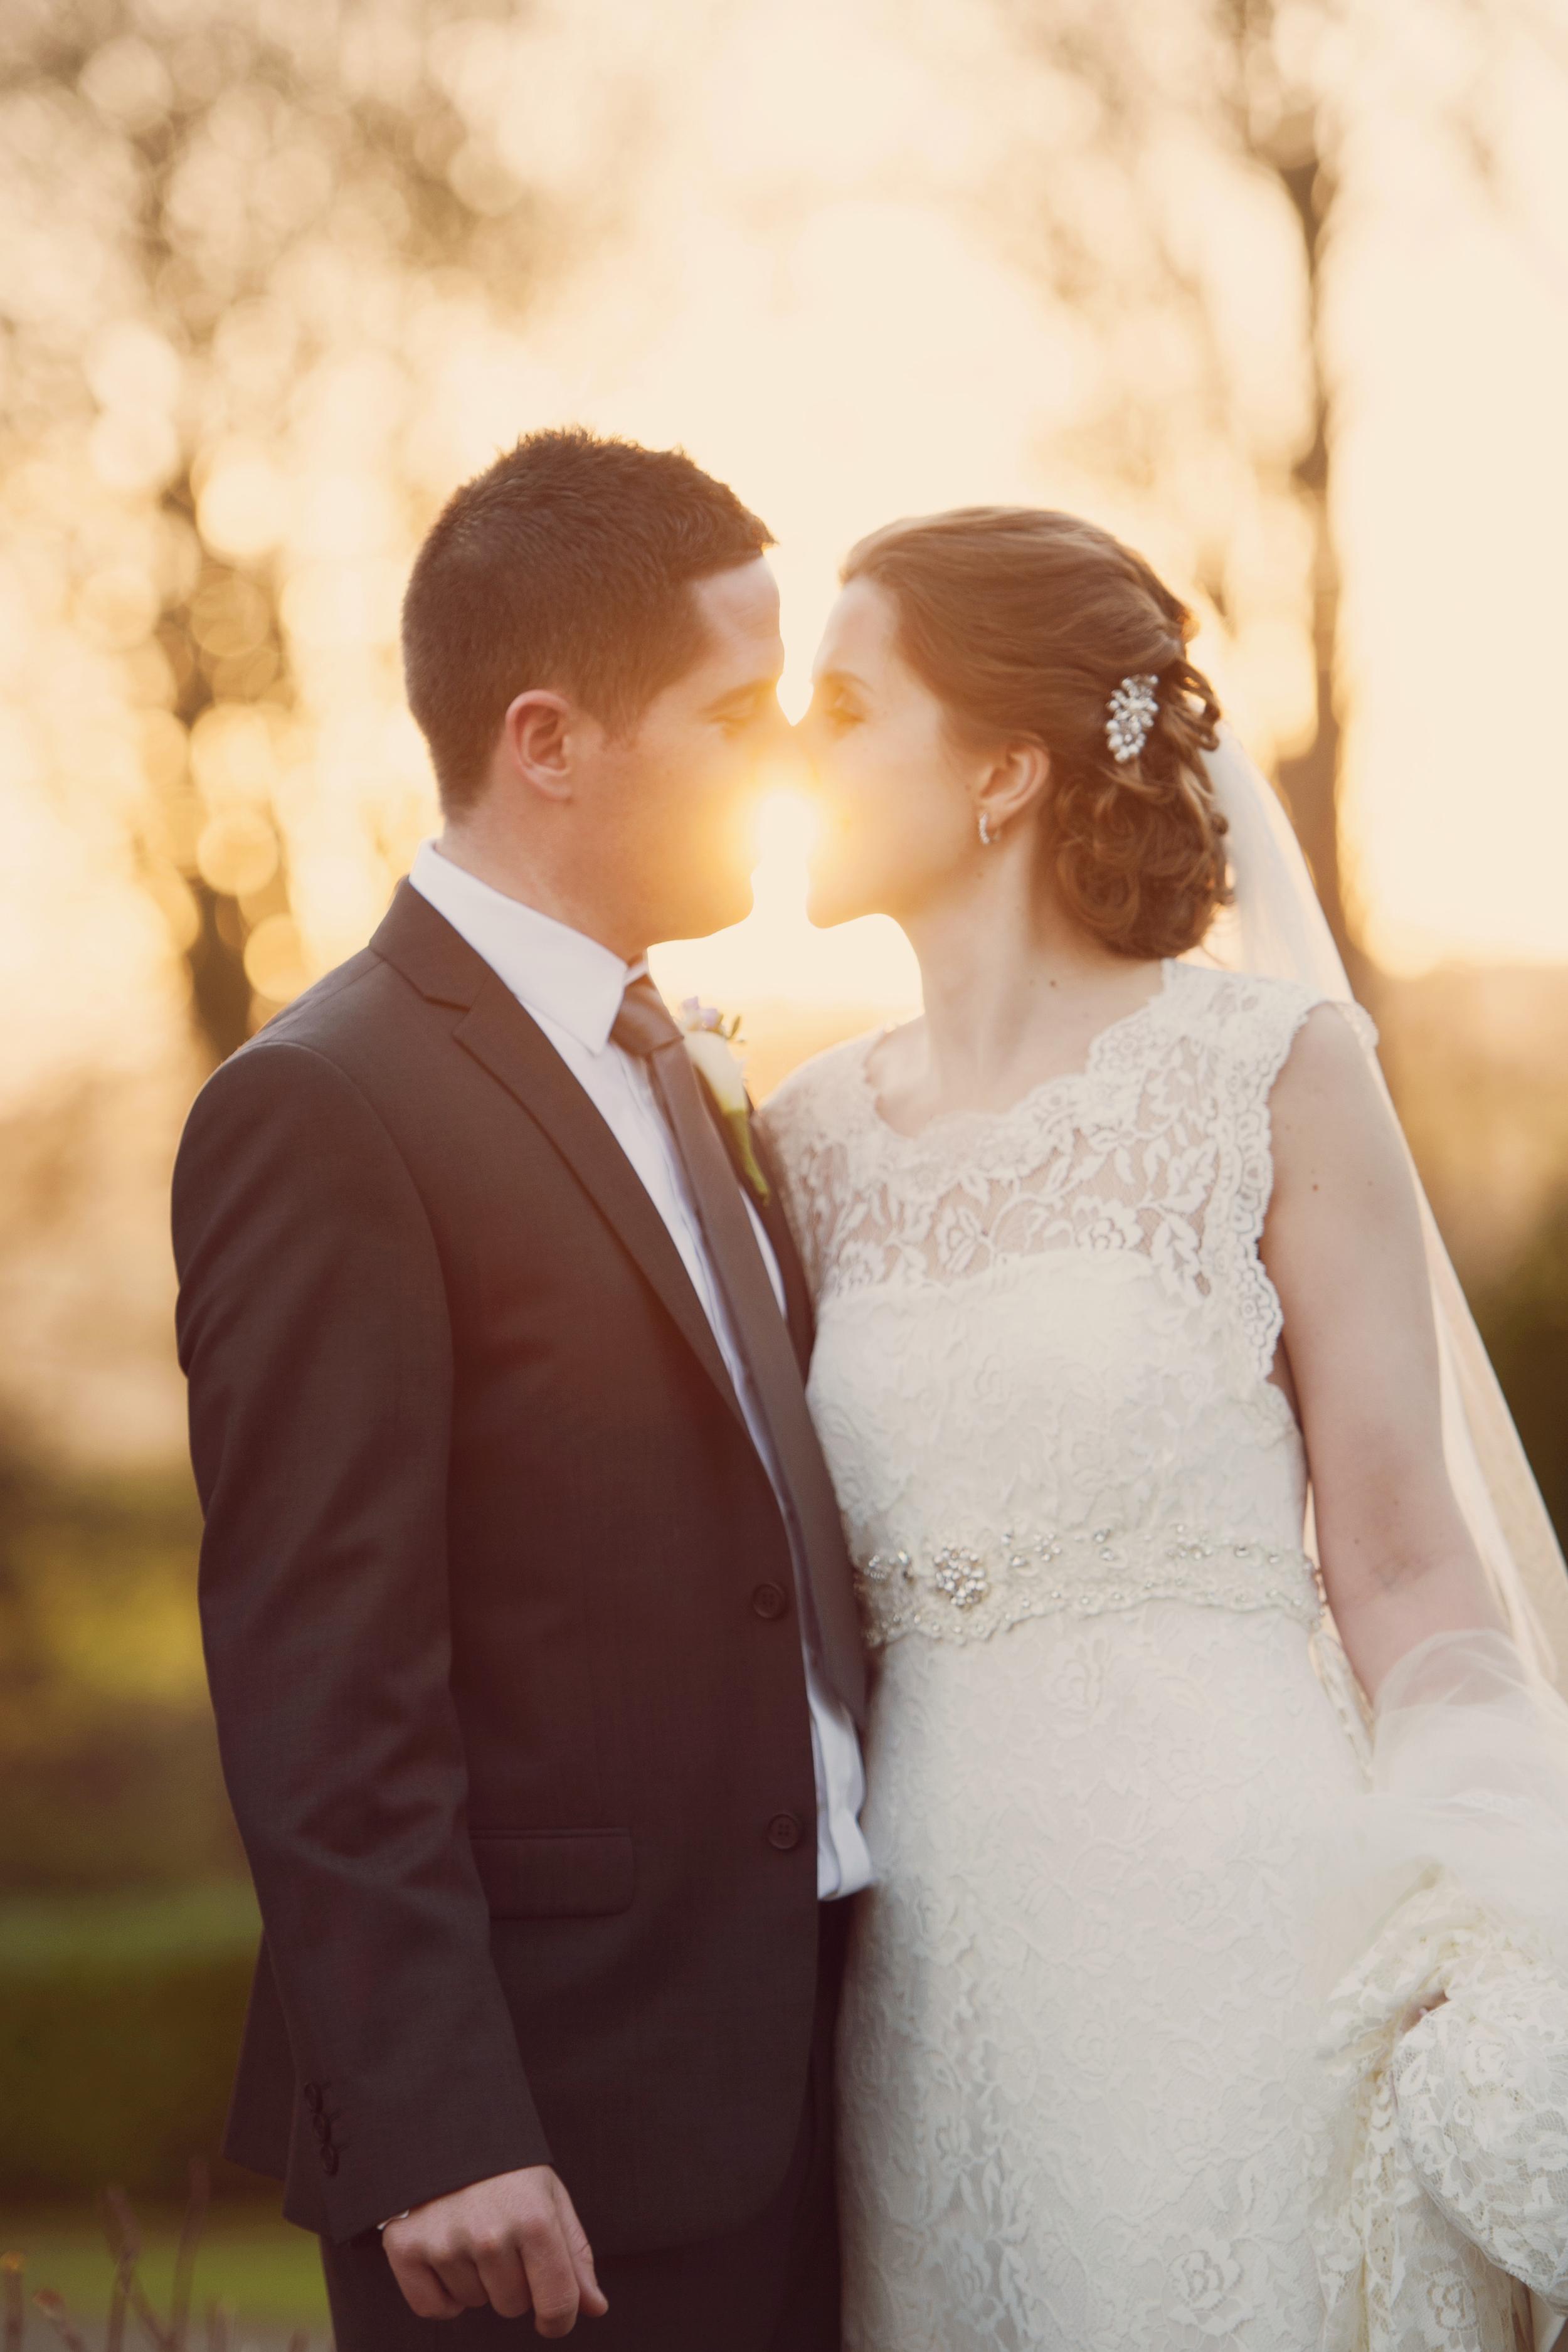 Wedding Photography Ireland Castle Durrow Laois Irish Wedding Photographer 101.jpg